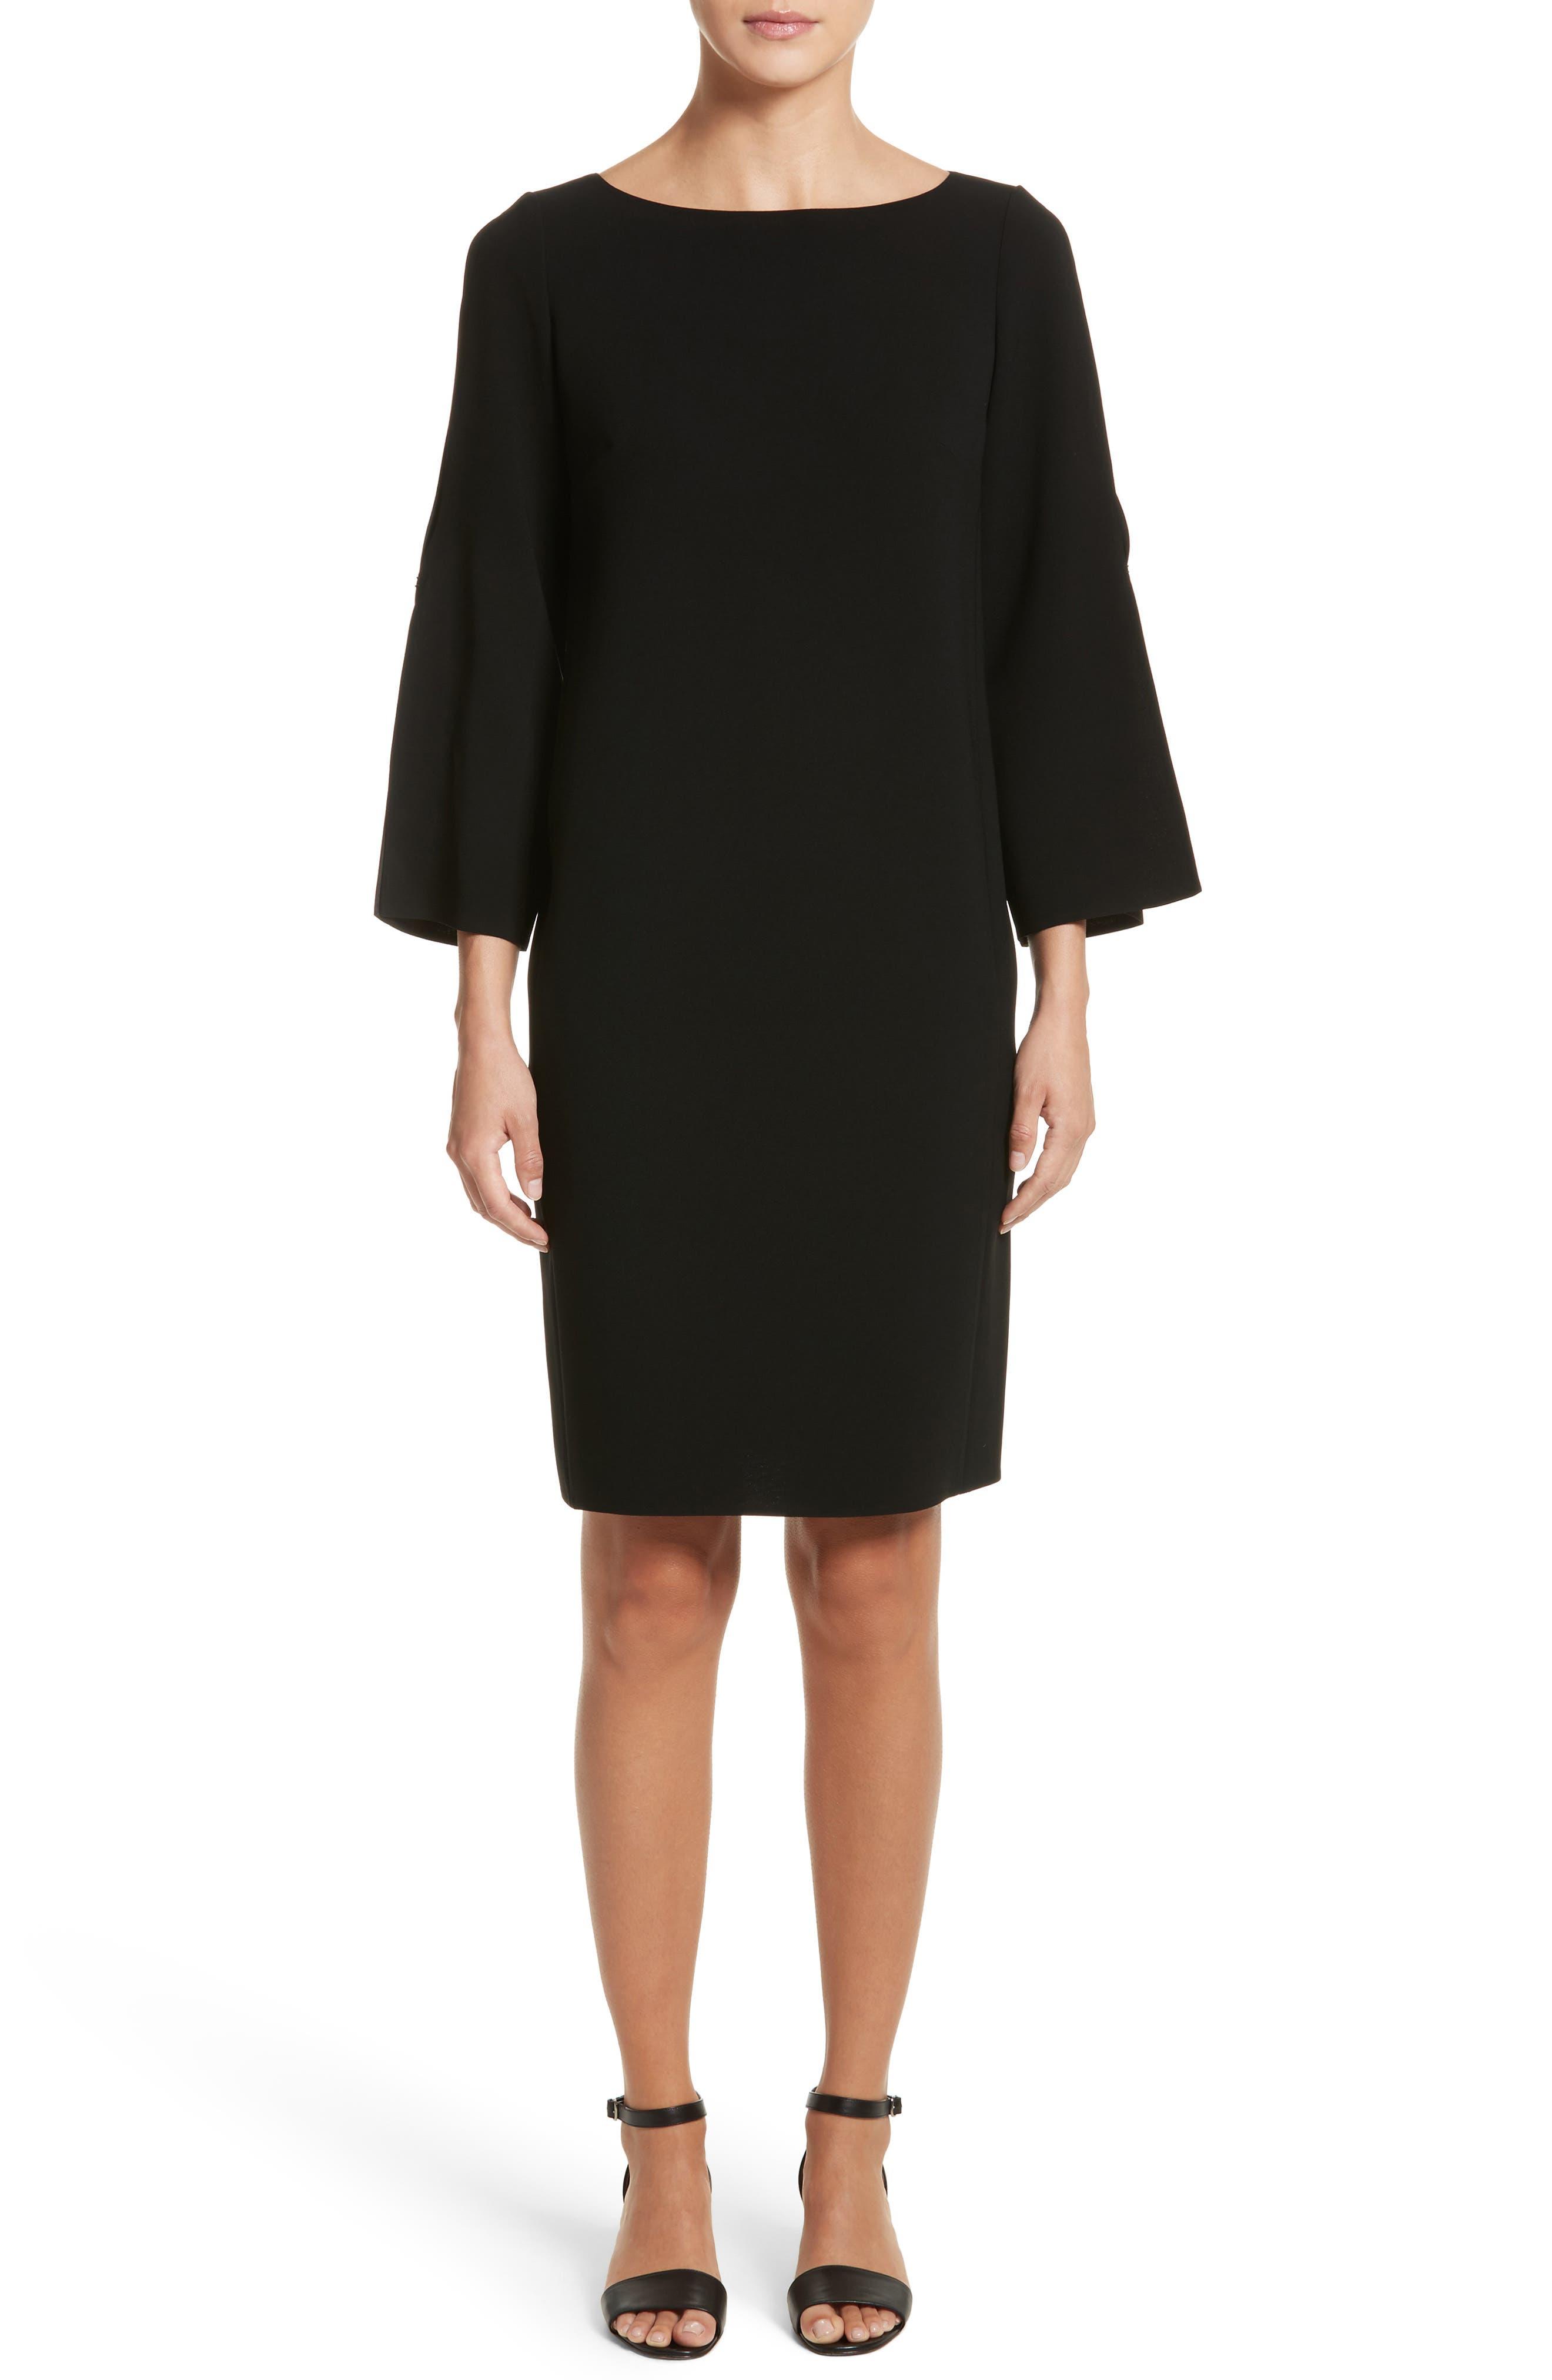 Candace Finesse Crepe Shift Dress,                             Main thumbnail 1, color,                             Black